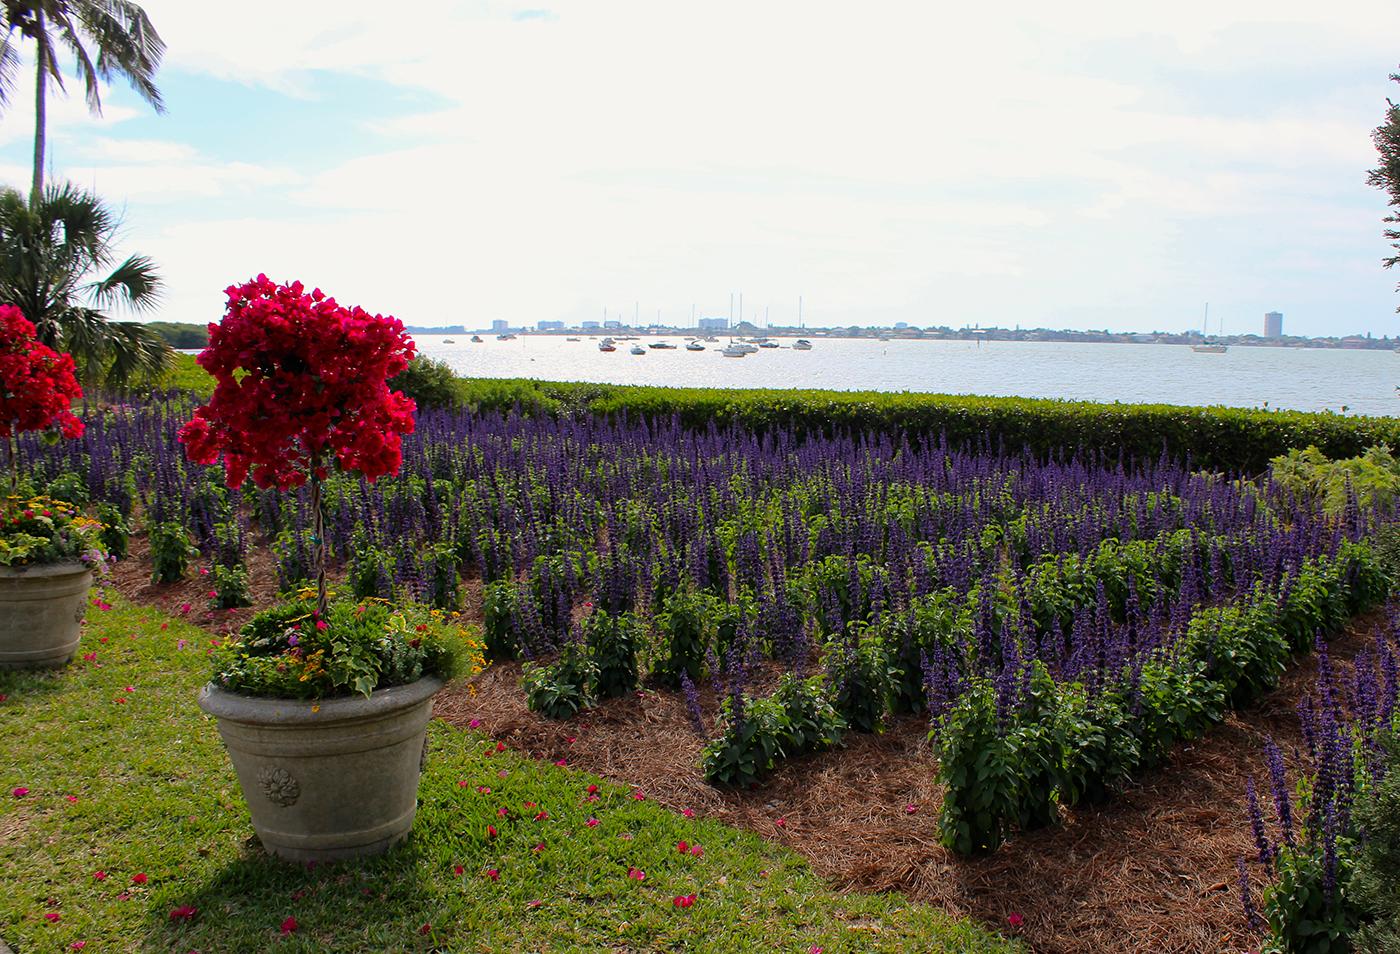 A Botanical Garden Blooms with Chagall Artes & contextos Selby4